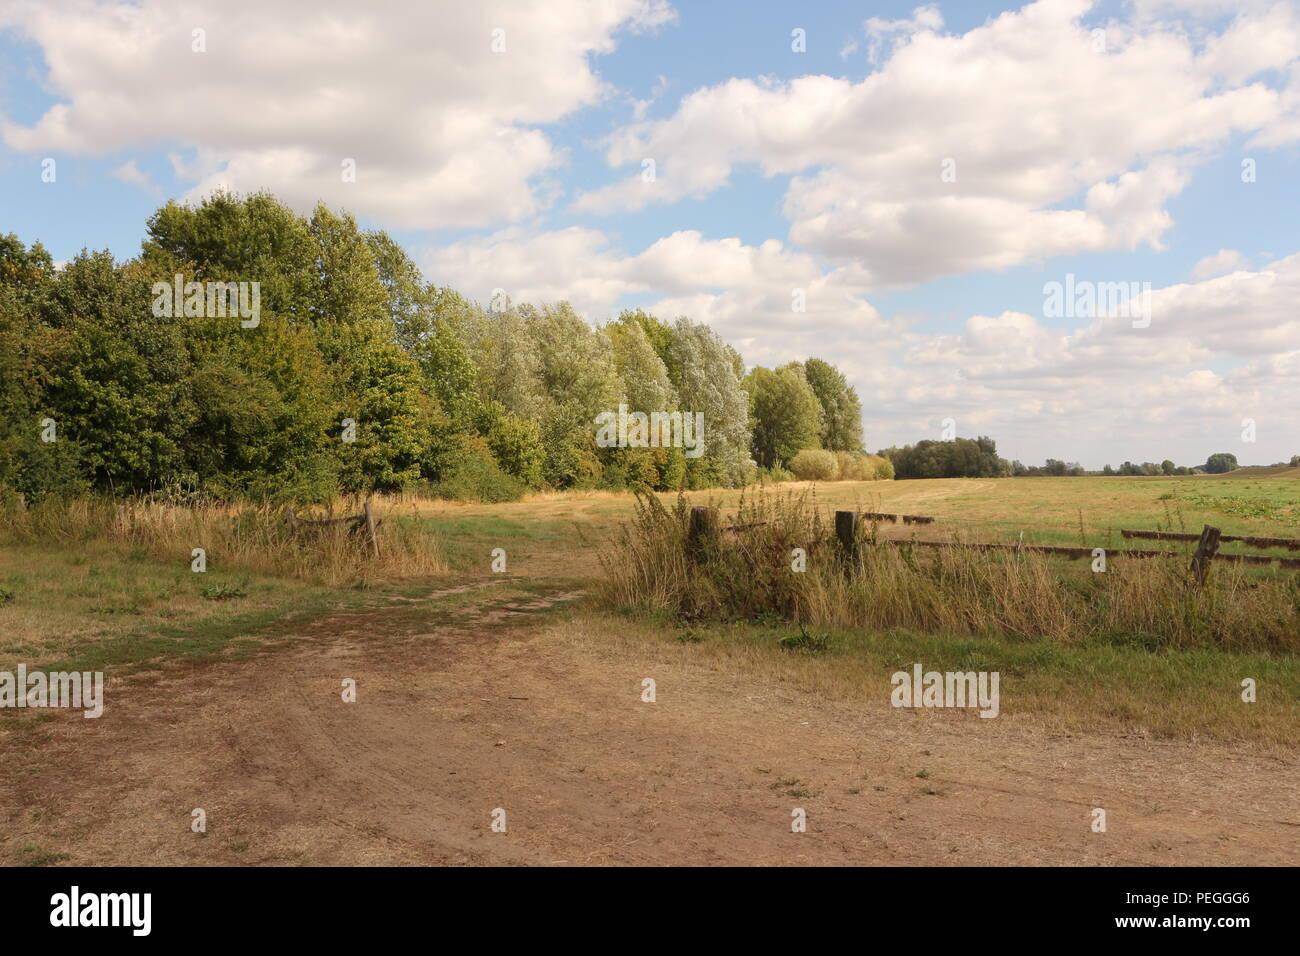 Naturlandschaft bei Xanten am Niederrhein - Stock Image